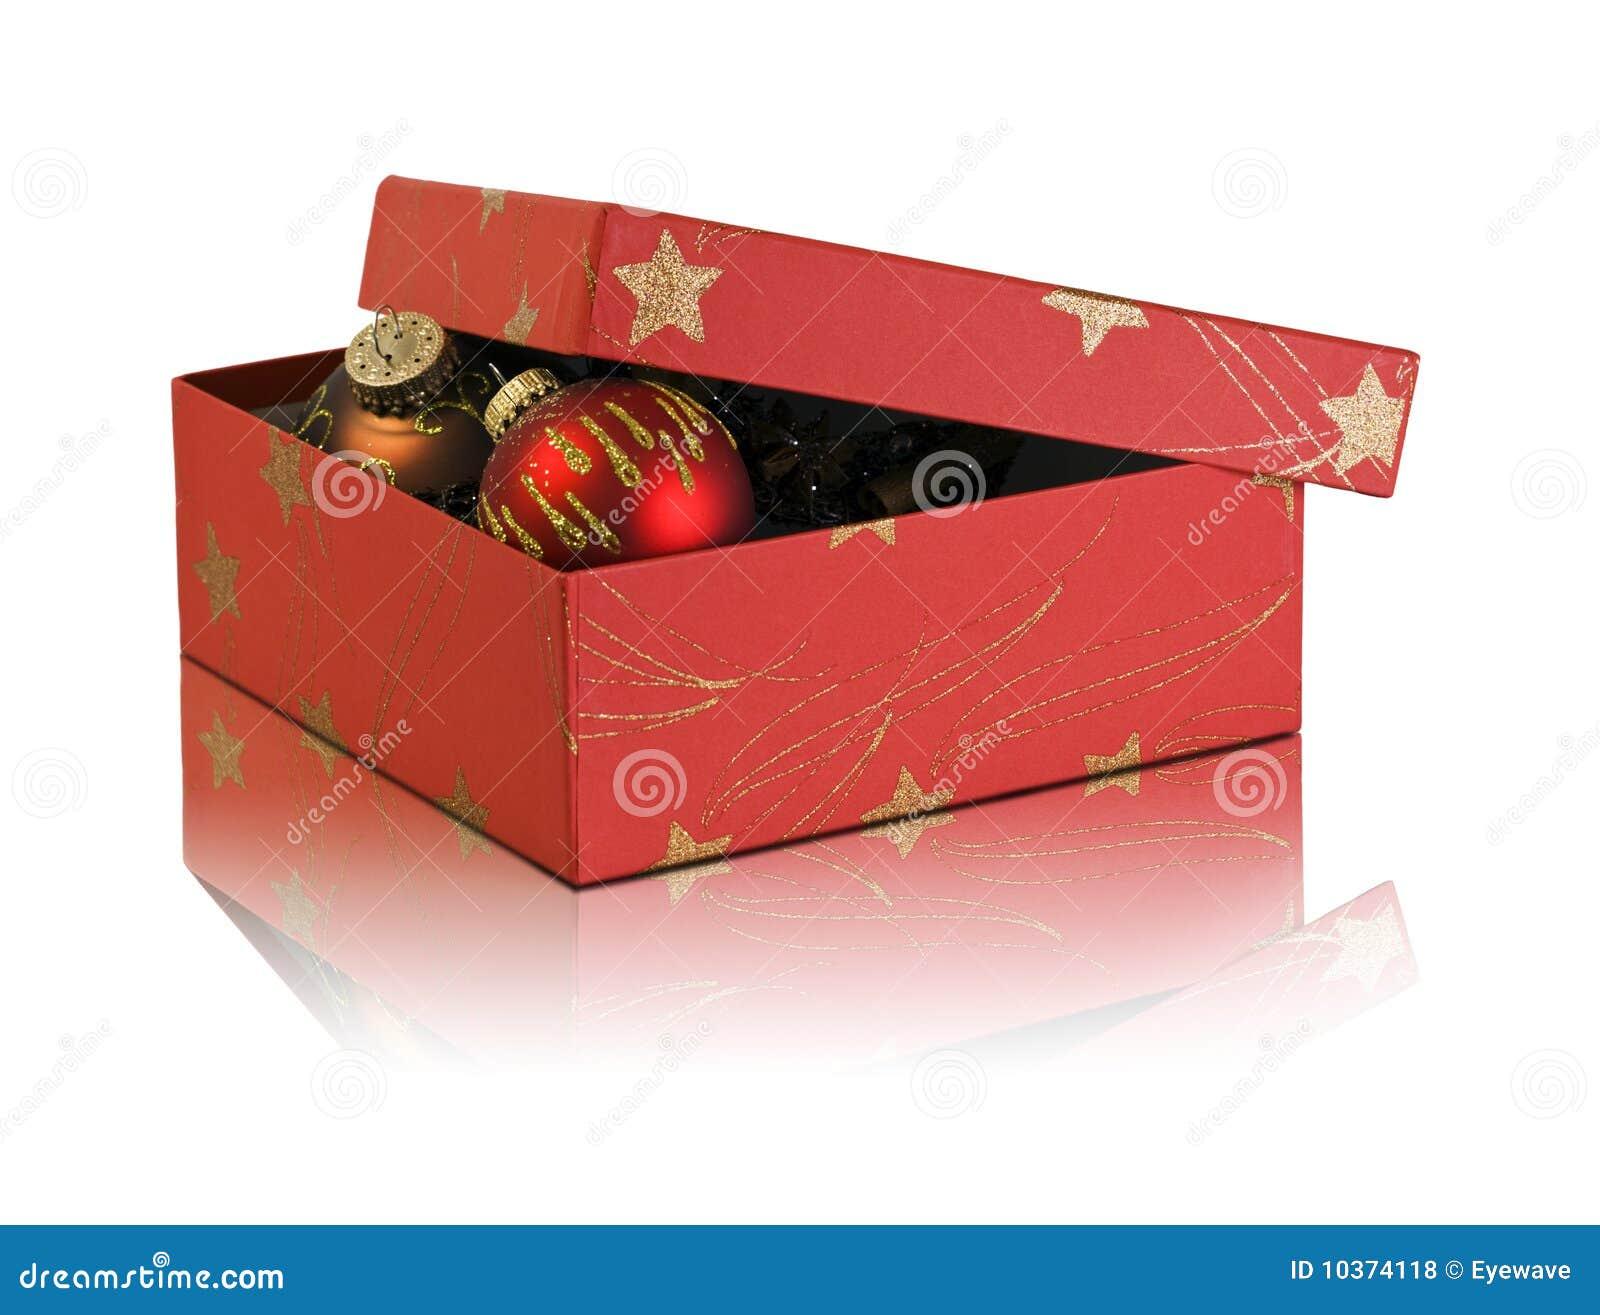 Bo te en carton avec la d coration de no l photos libres - Decoration boite en carton ...